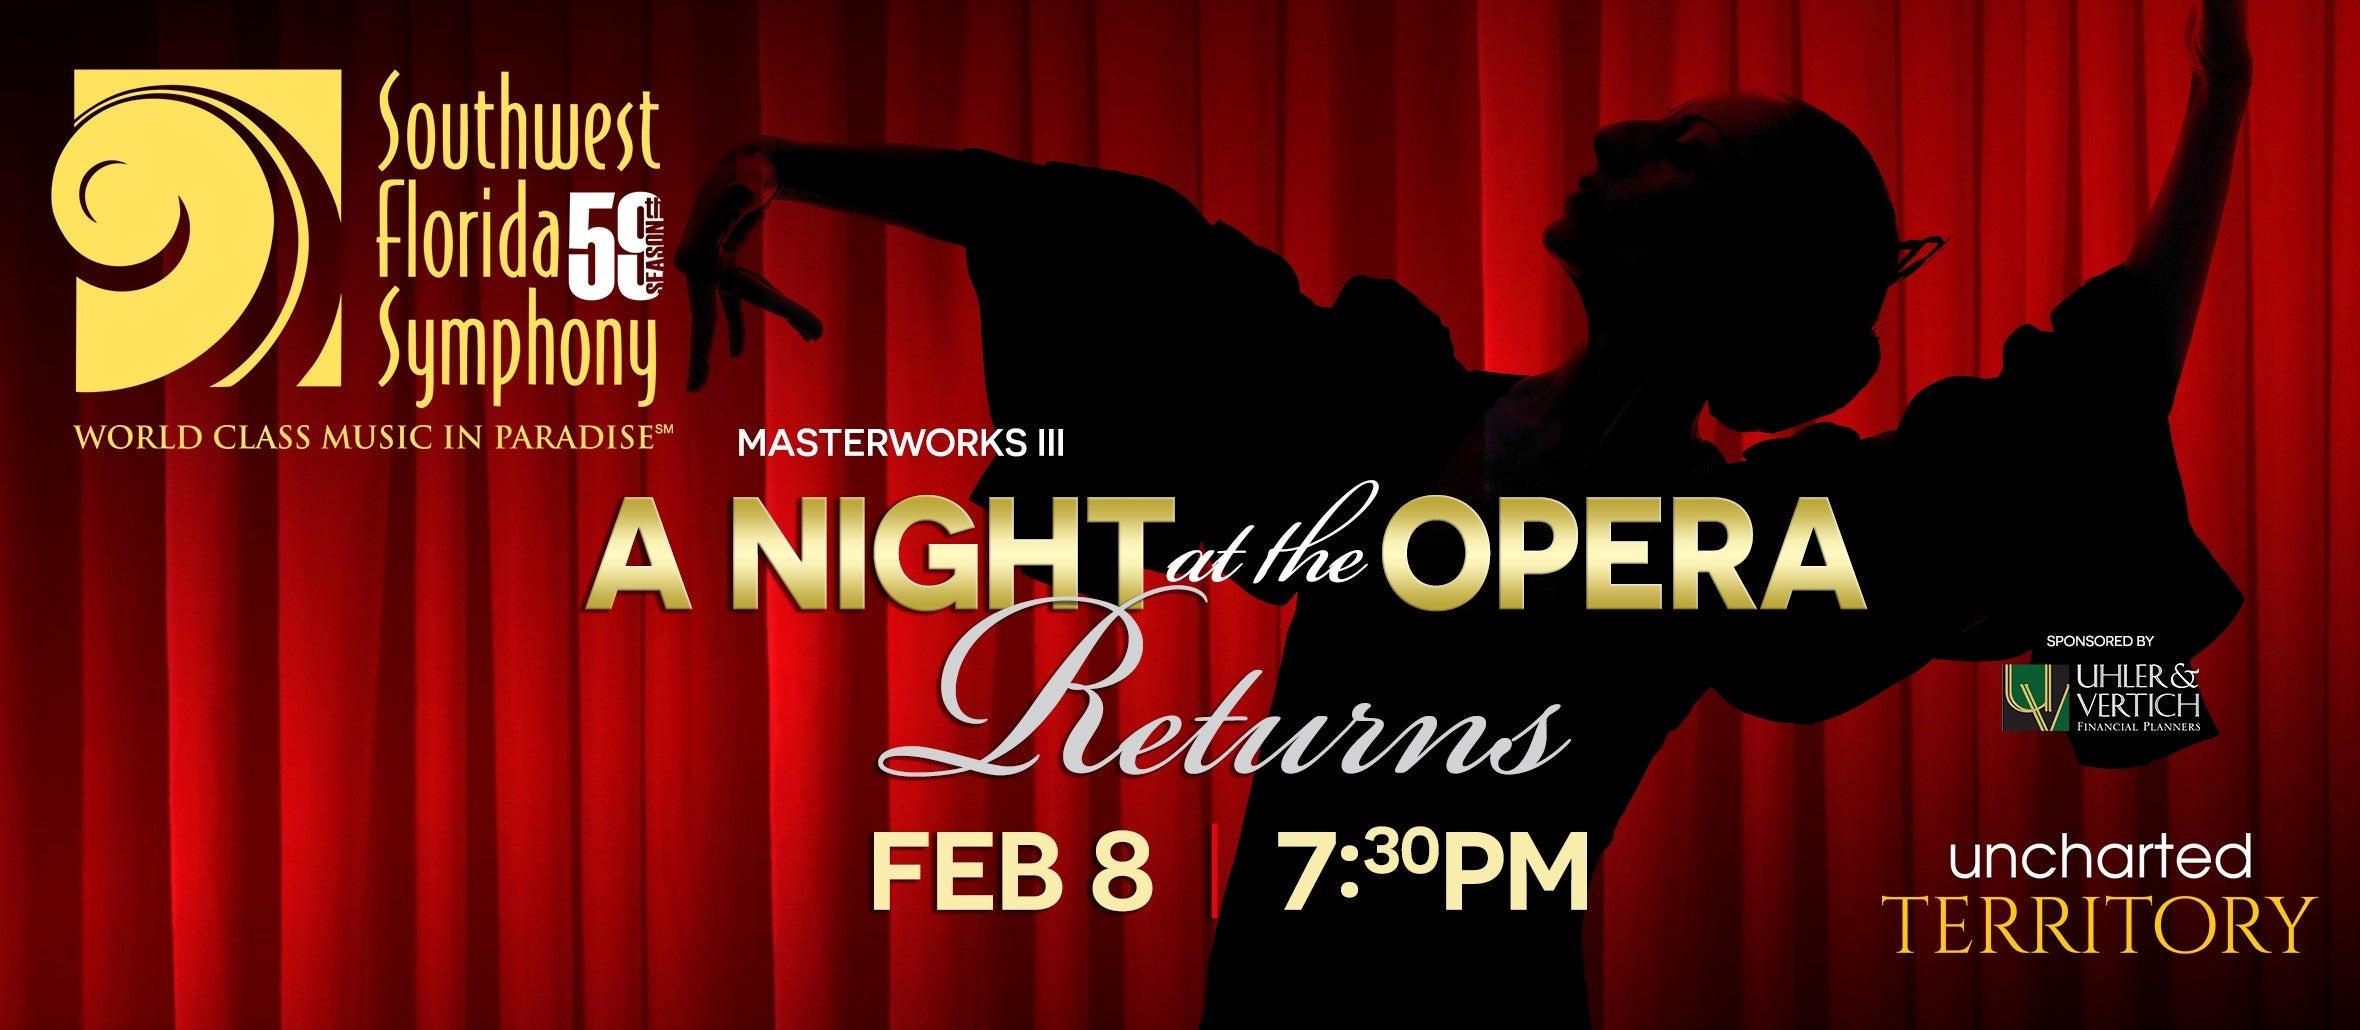 Southwest Florida Symphony MW3 - A Night at the Opera Returns